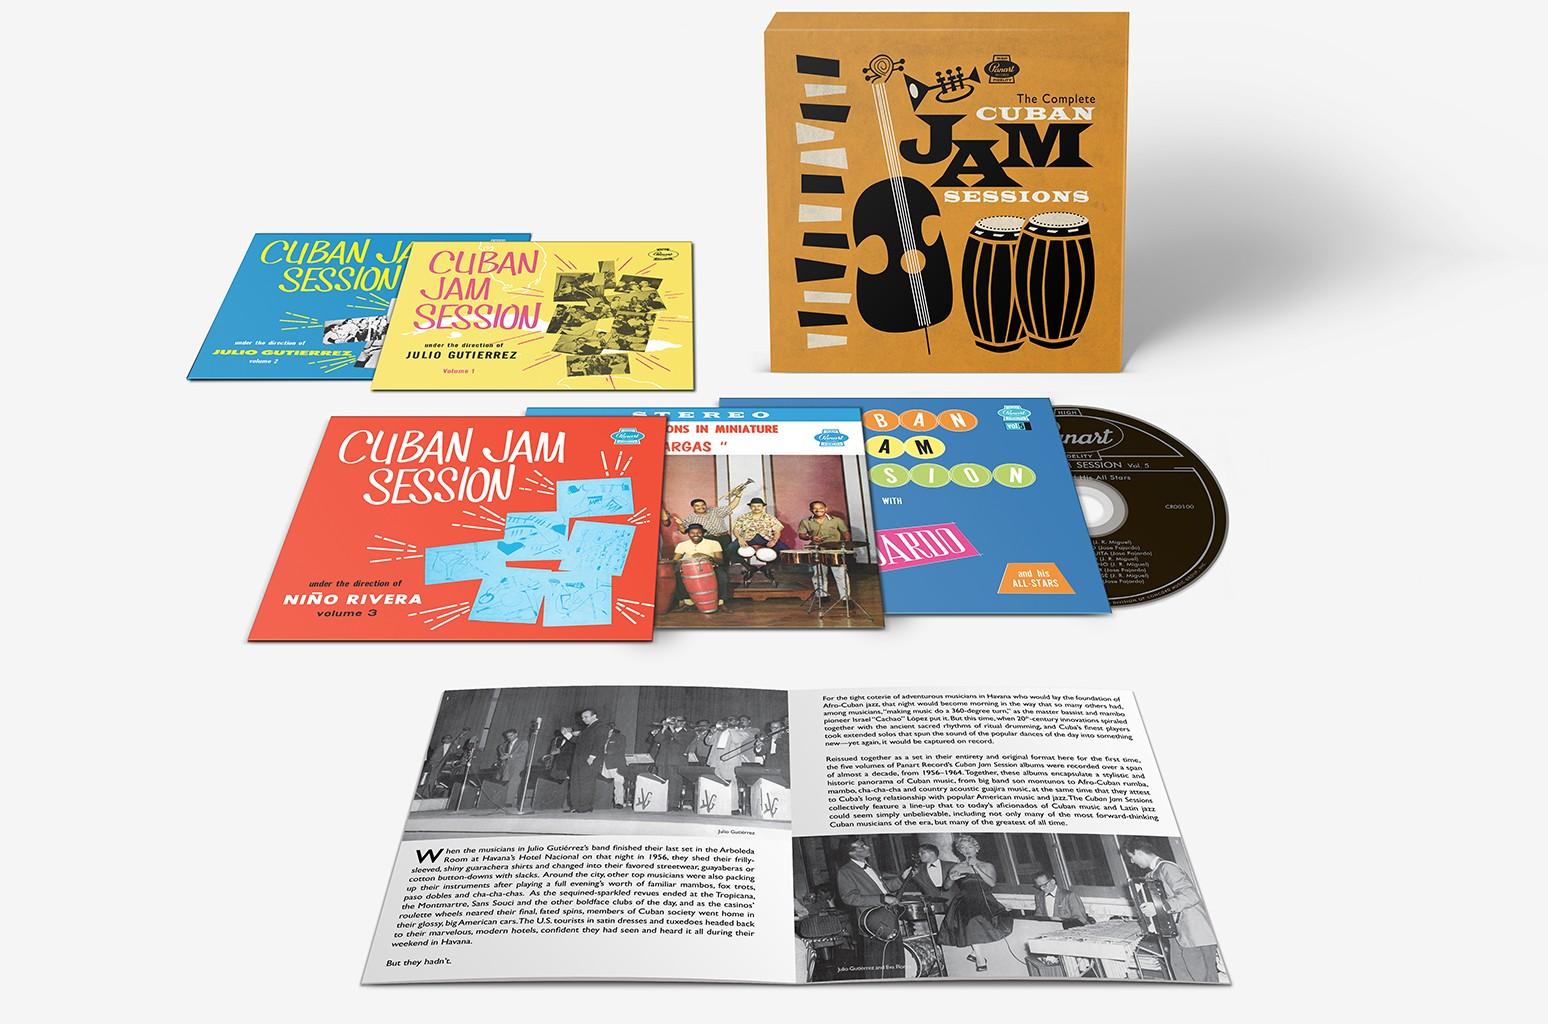 The Complete Cuban Jam Sessions Boxset